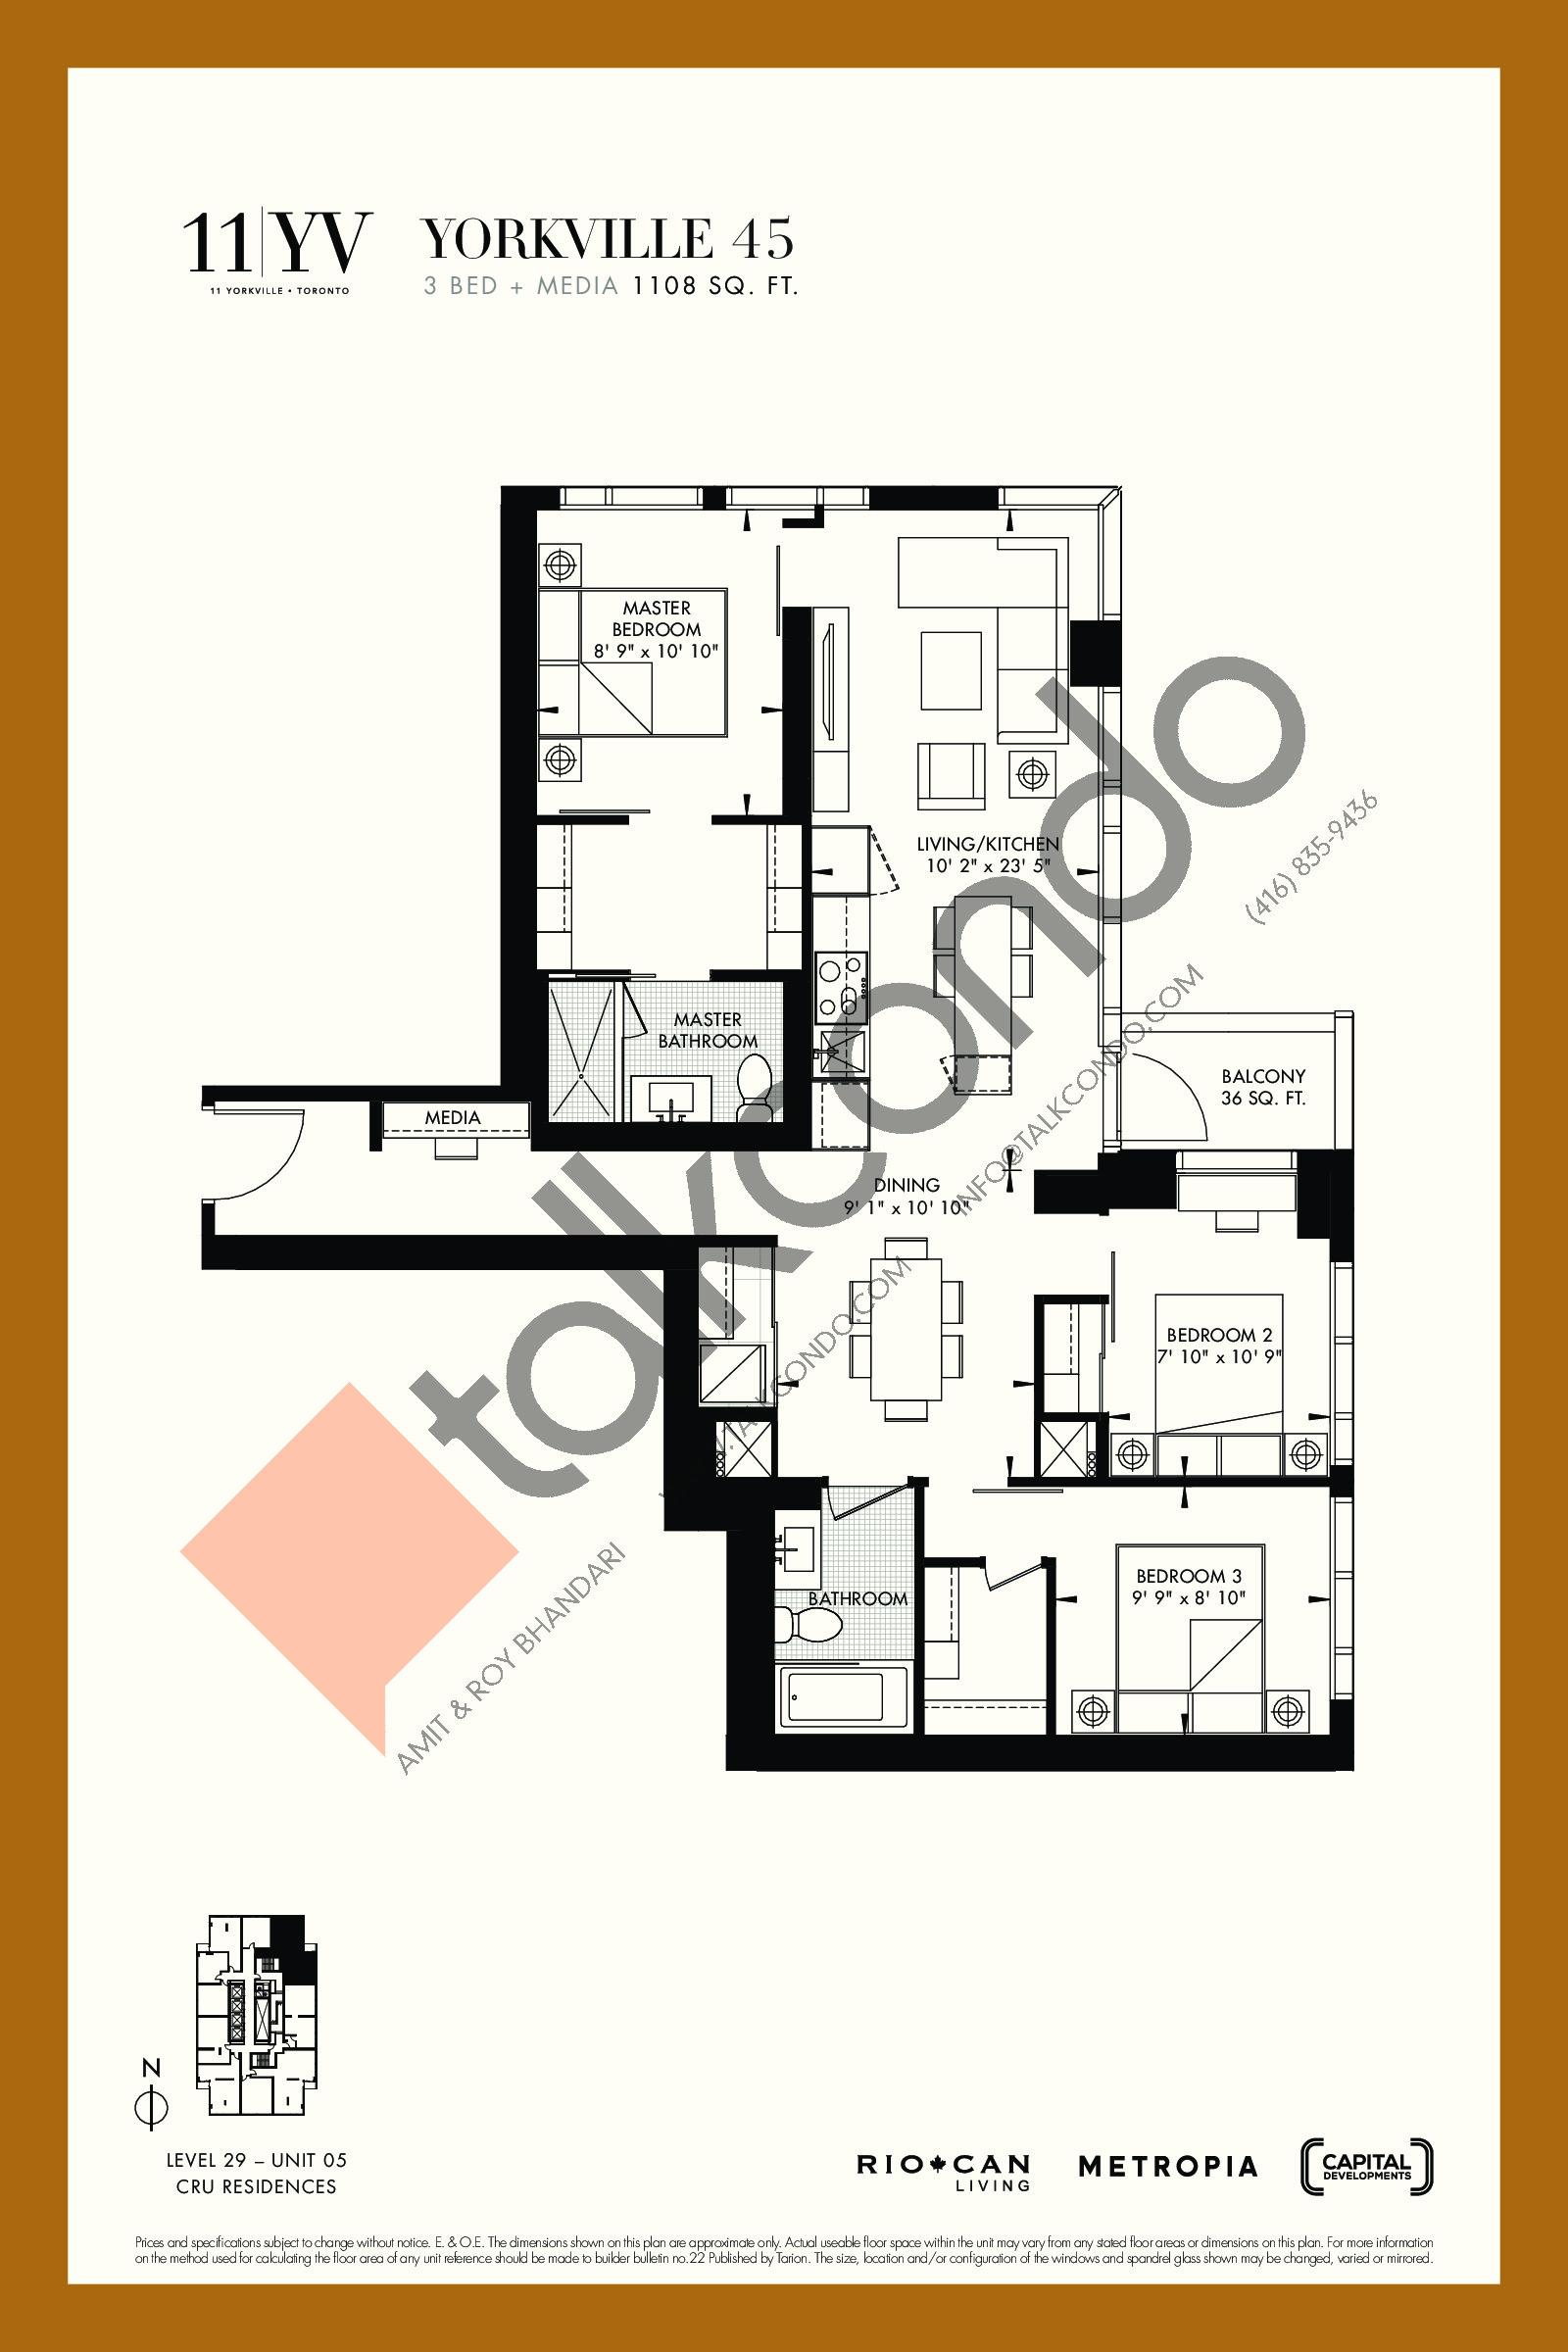 Yorkville 45 Floor Plan at 11YV Condos - 1108 sq.ft